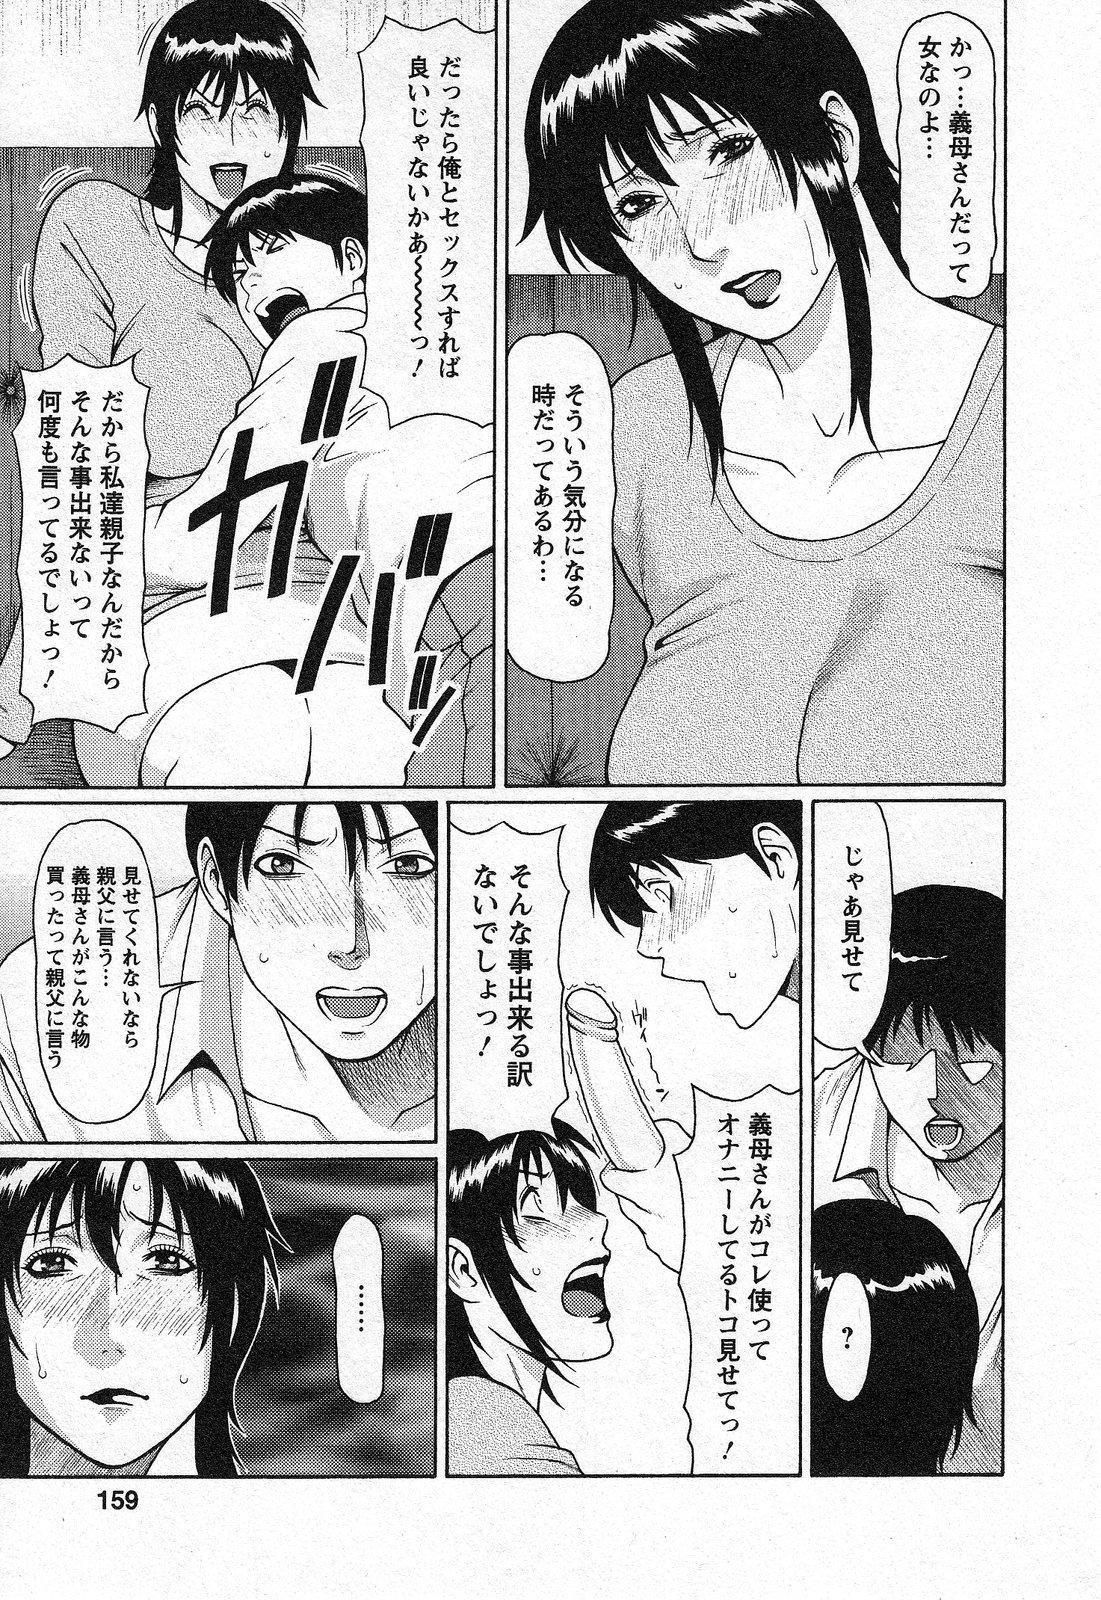 Tenshi ni Omakase 157